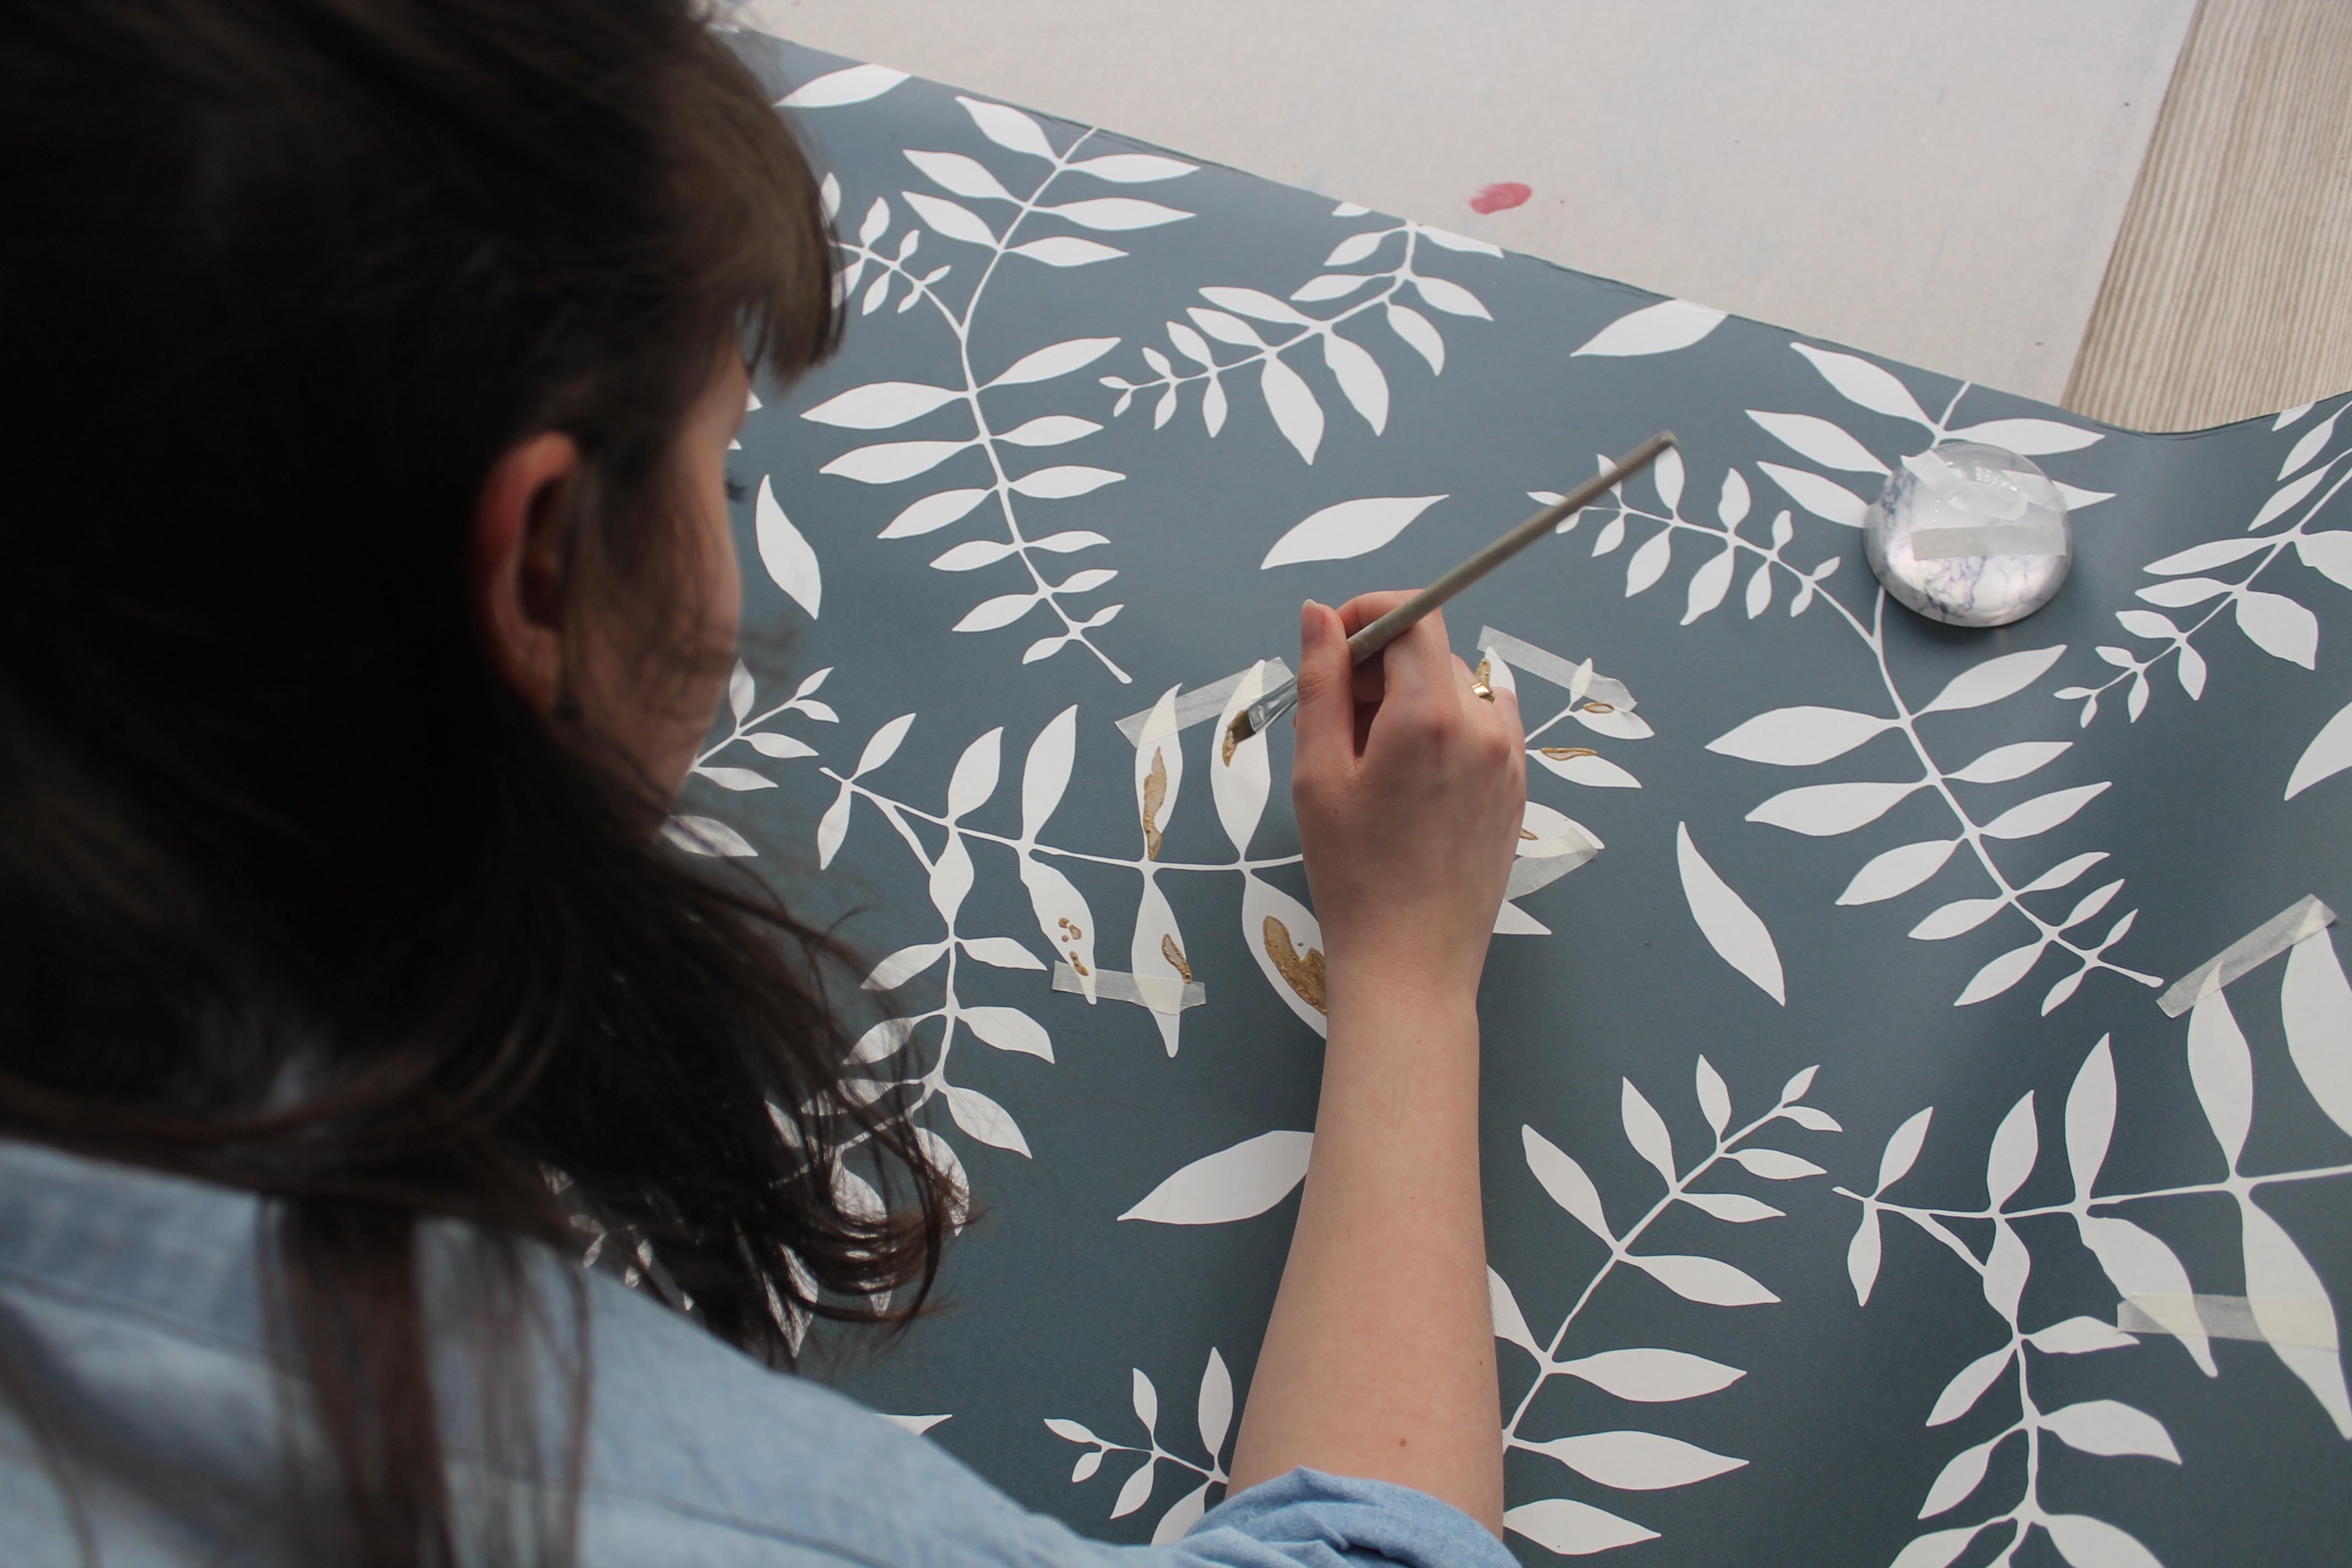 Melissa draws on wallpaper